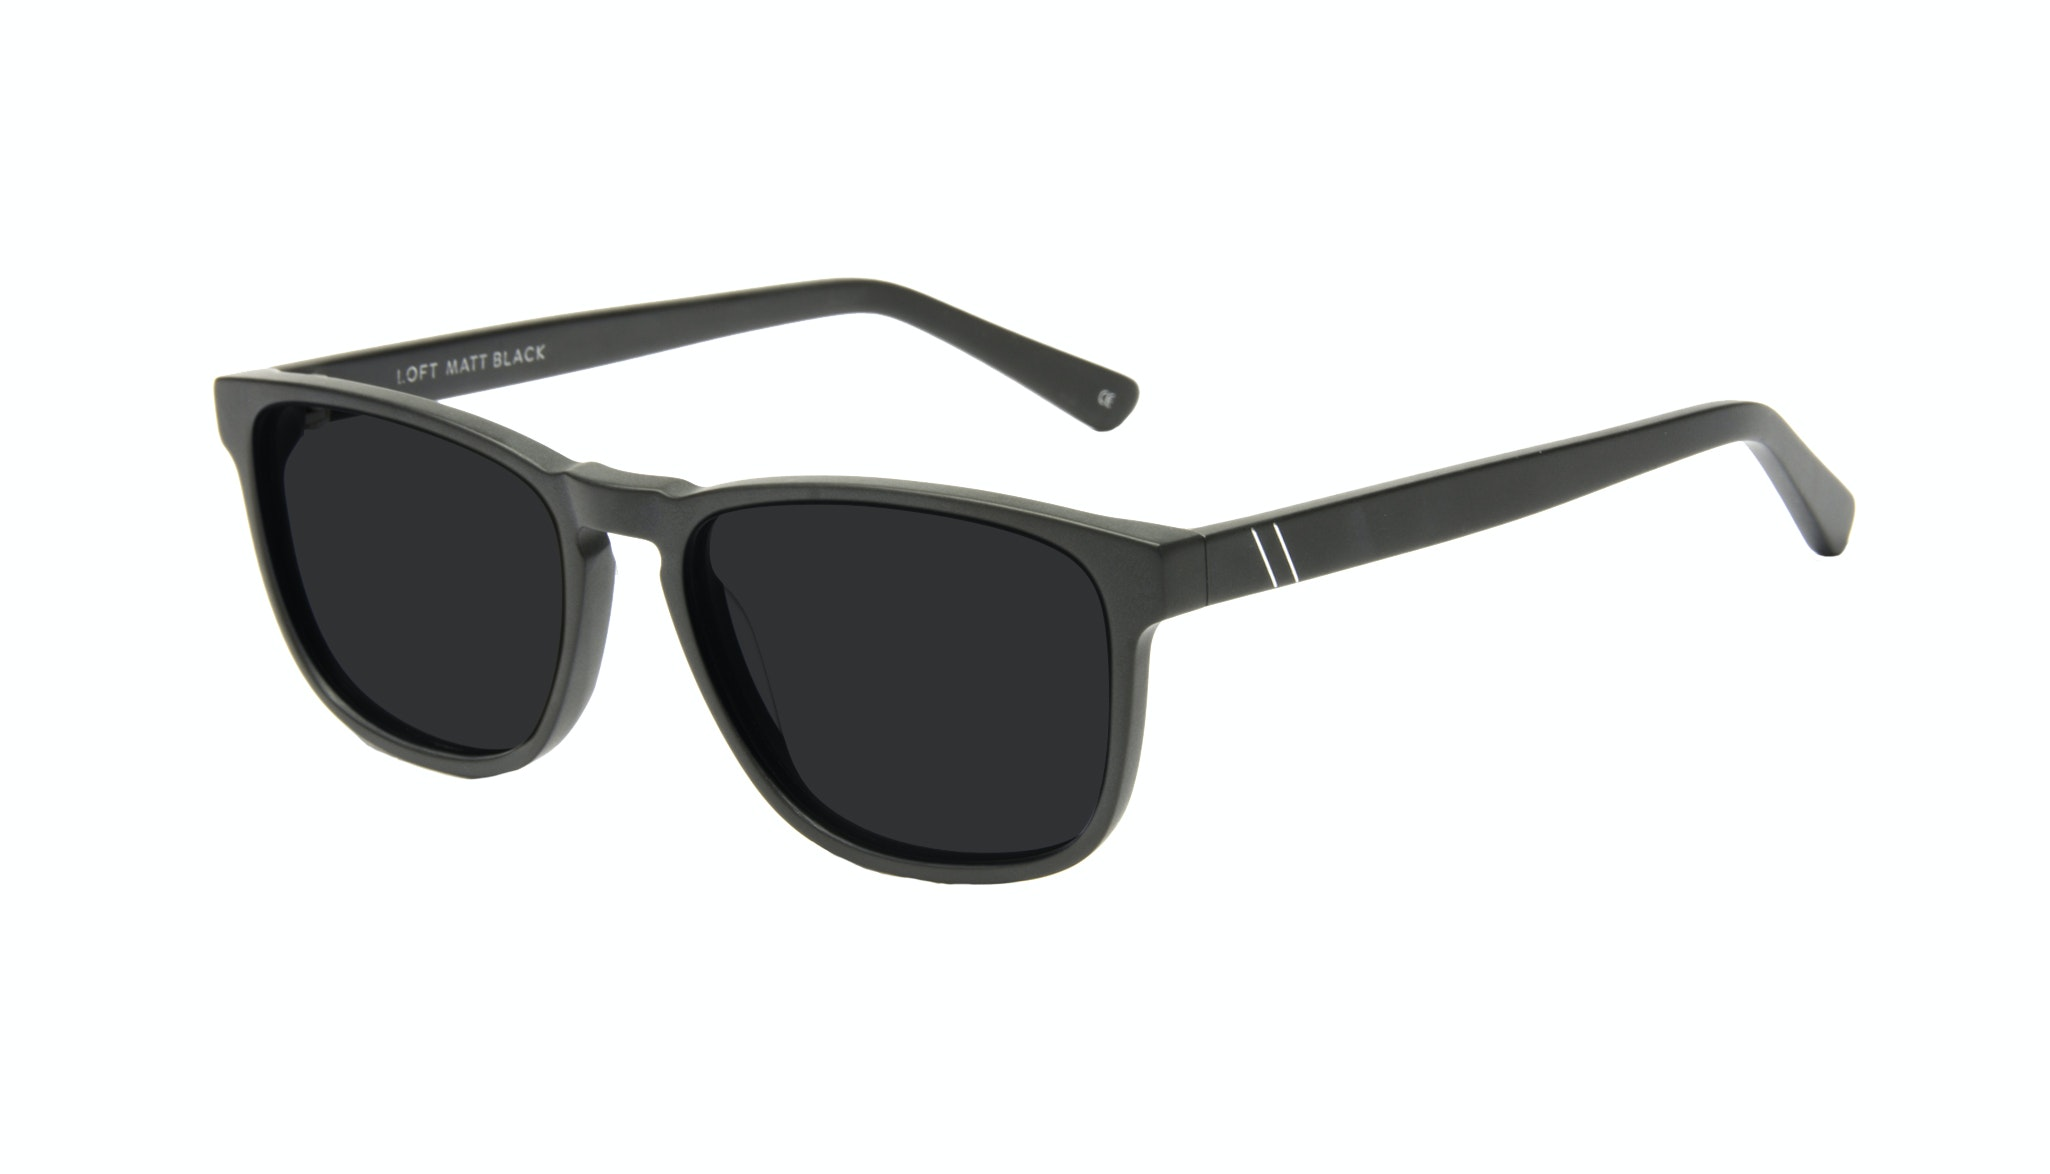 Affordable Fashion Glasses Rectangle Sunglasses Men Loft Matte Black Tilt